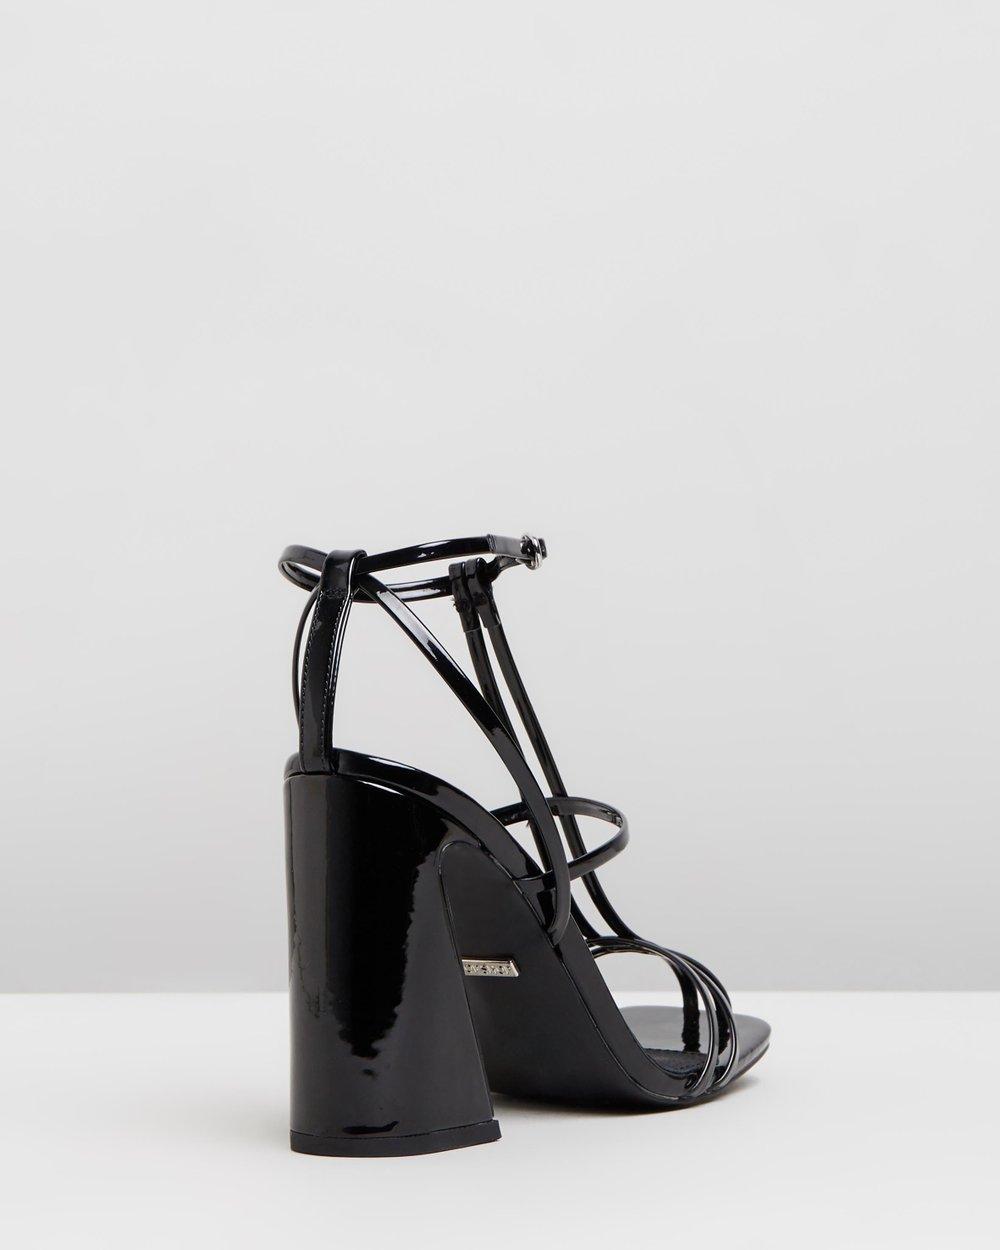 cc588209881dbd Romi Cage Sandals by TOPSHOP Online